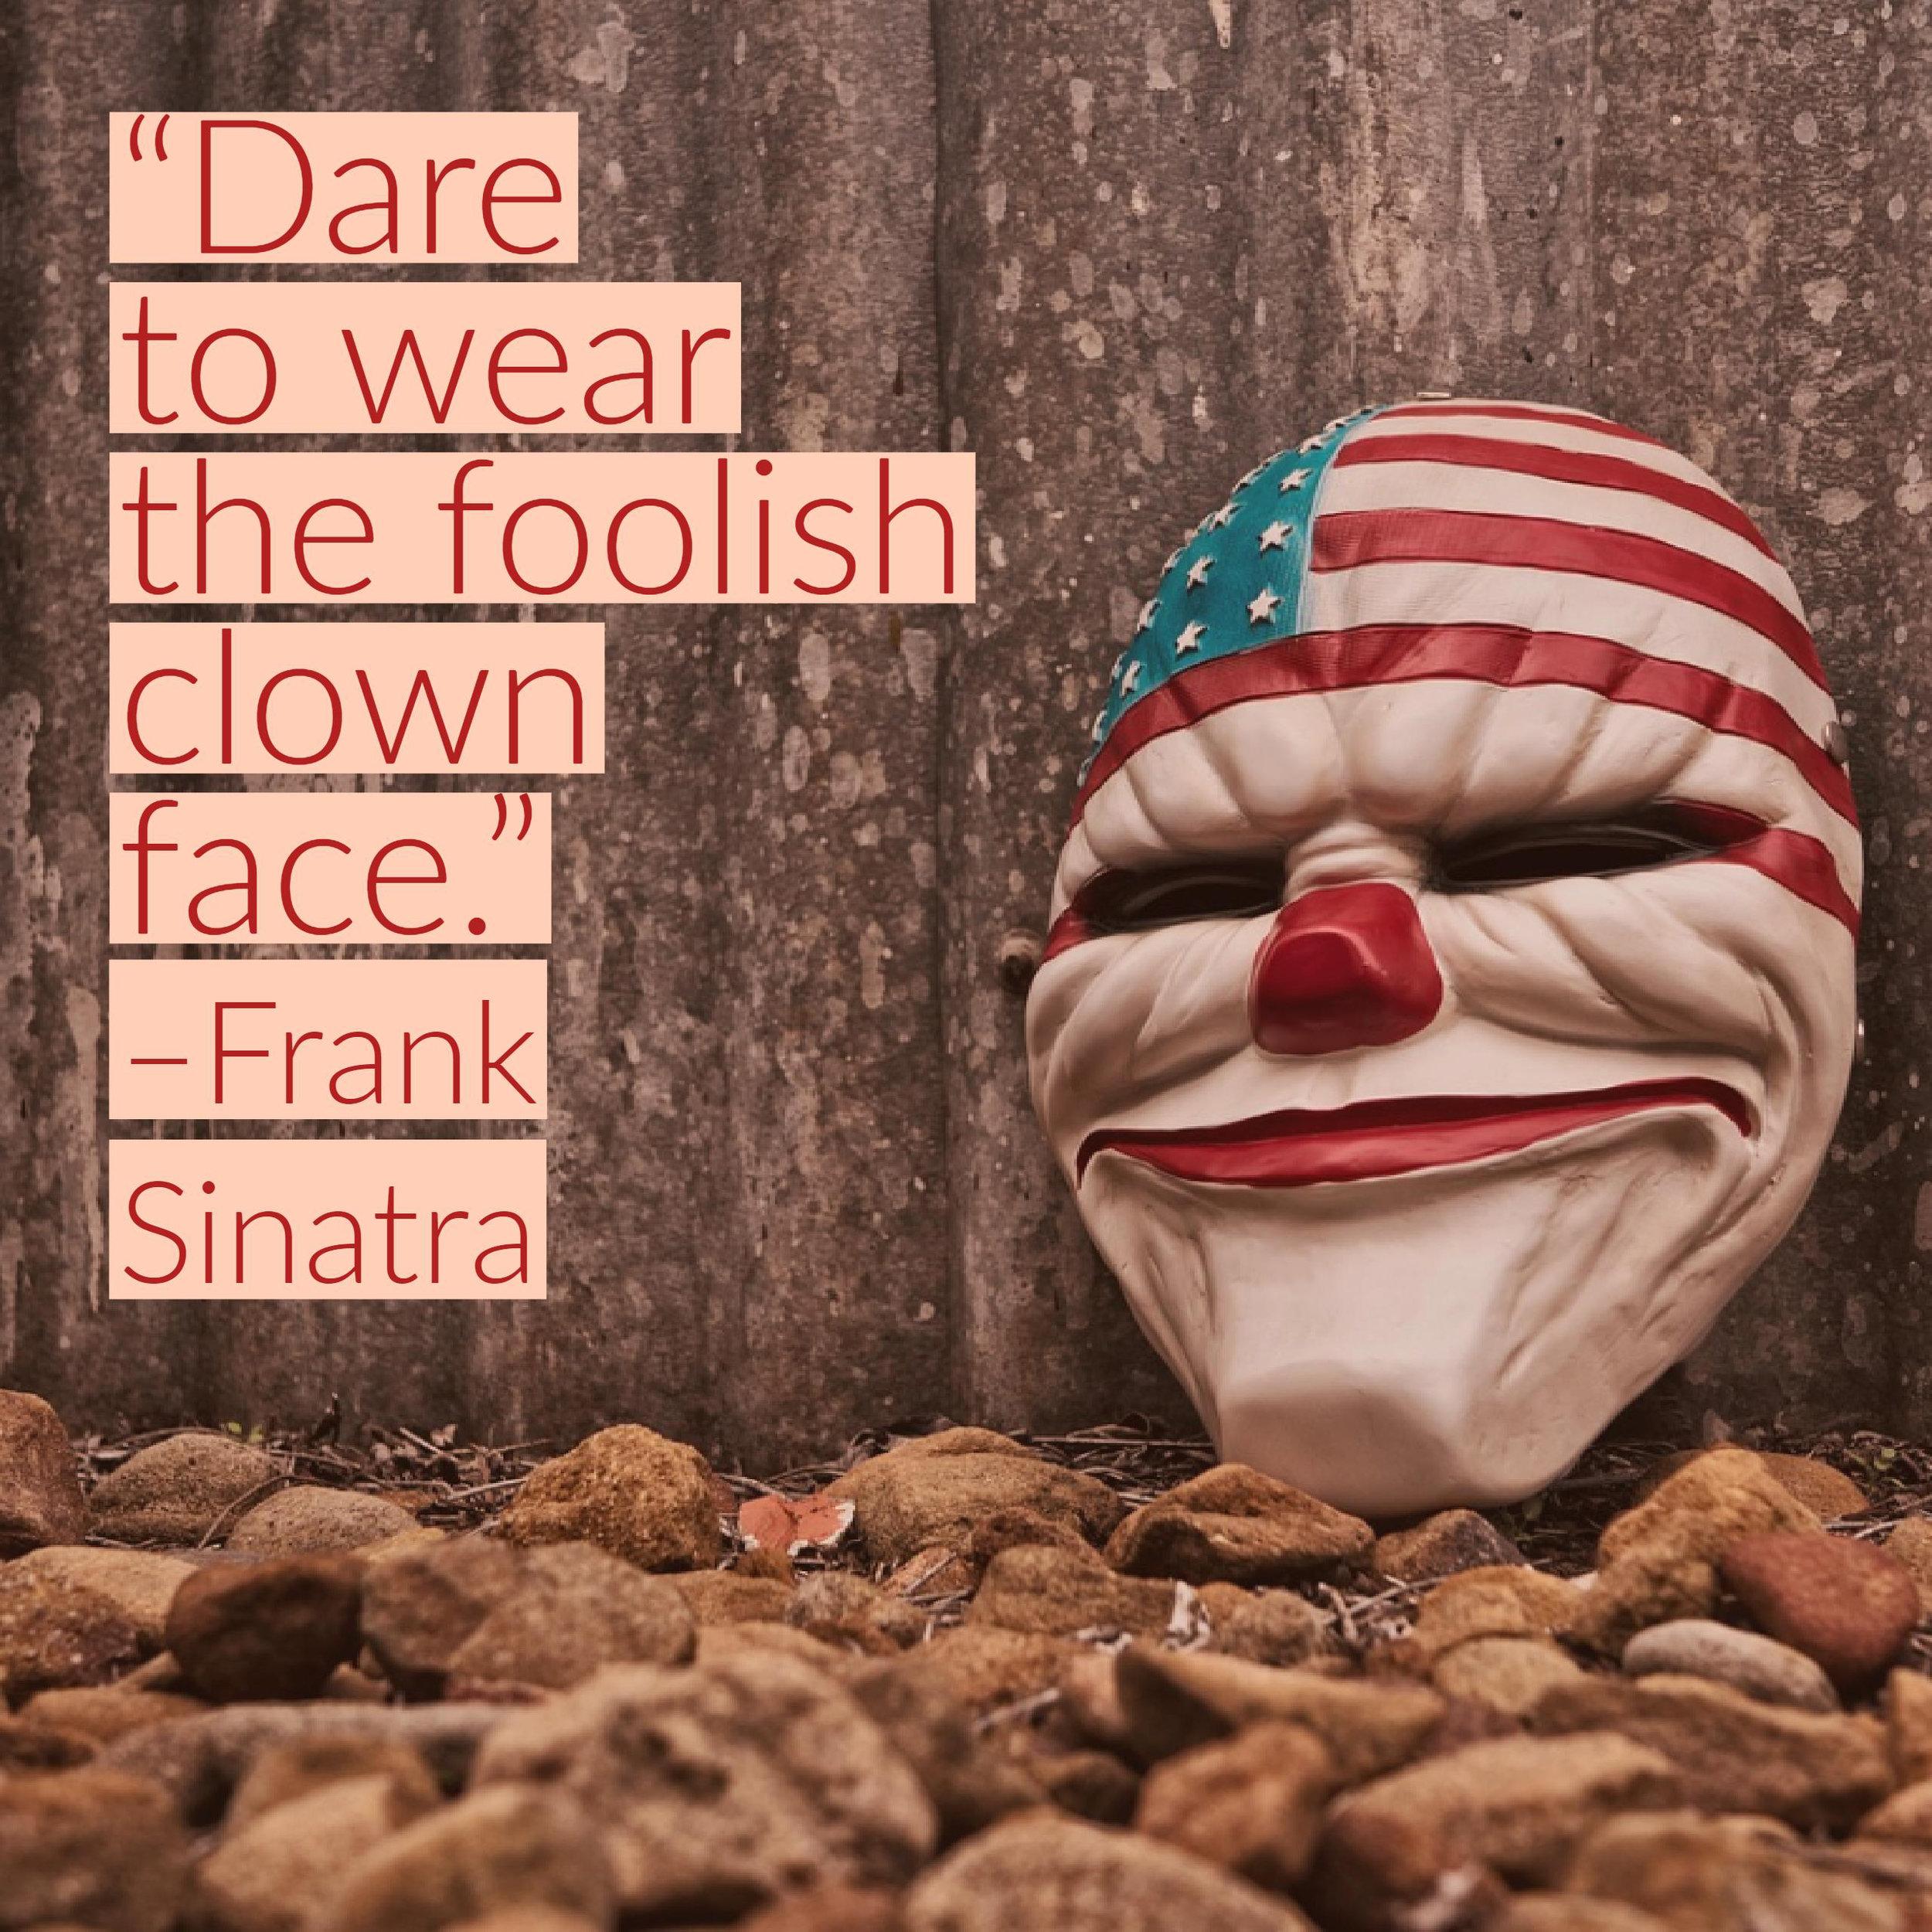 Frank-Sinatra-Meme